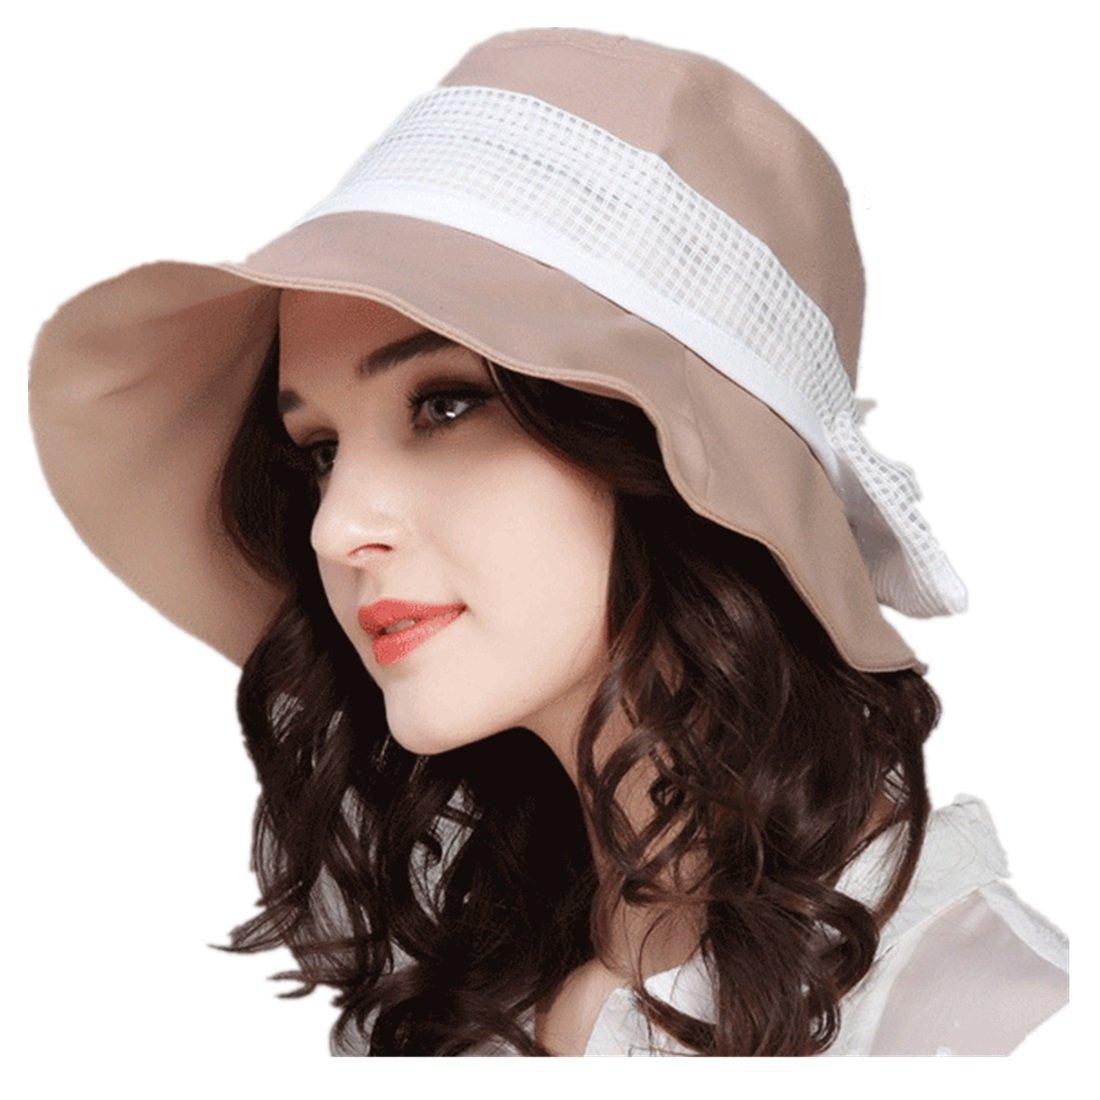 0a7e24ef1d485 LLmoway Foldable Women Sun Hats Wide Brim Safari Hat with String UV  Protection Caps Dry Fit Khaki